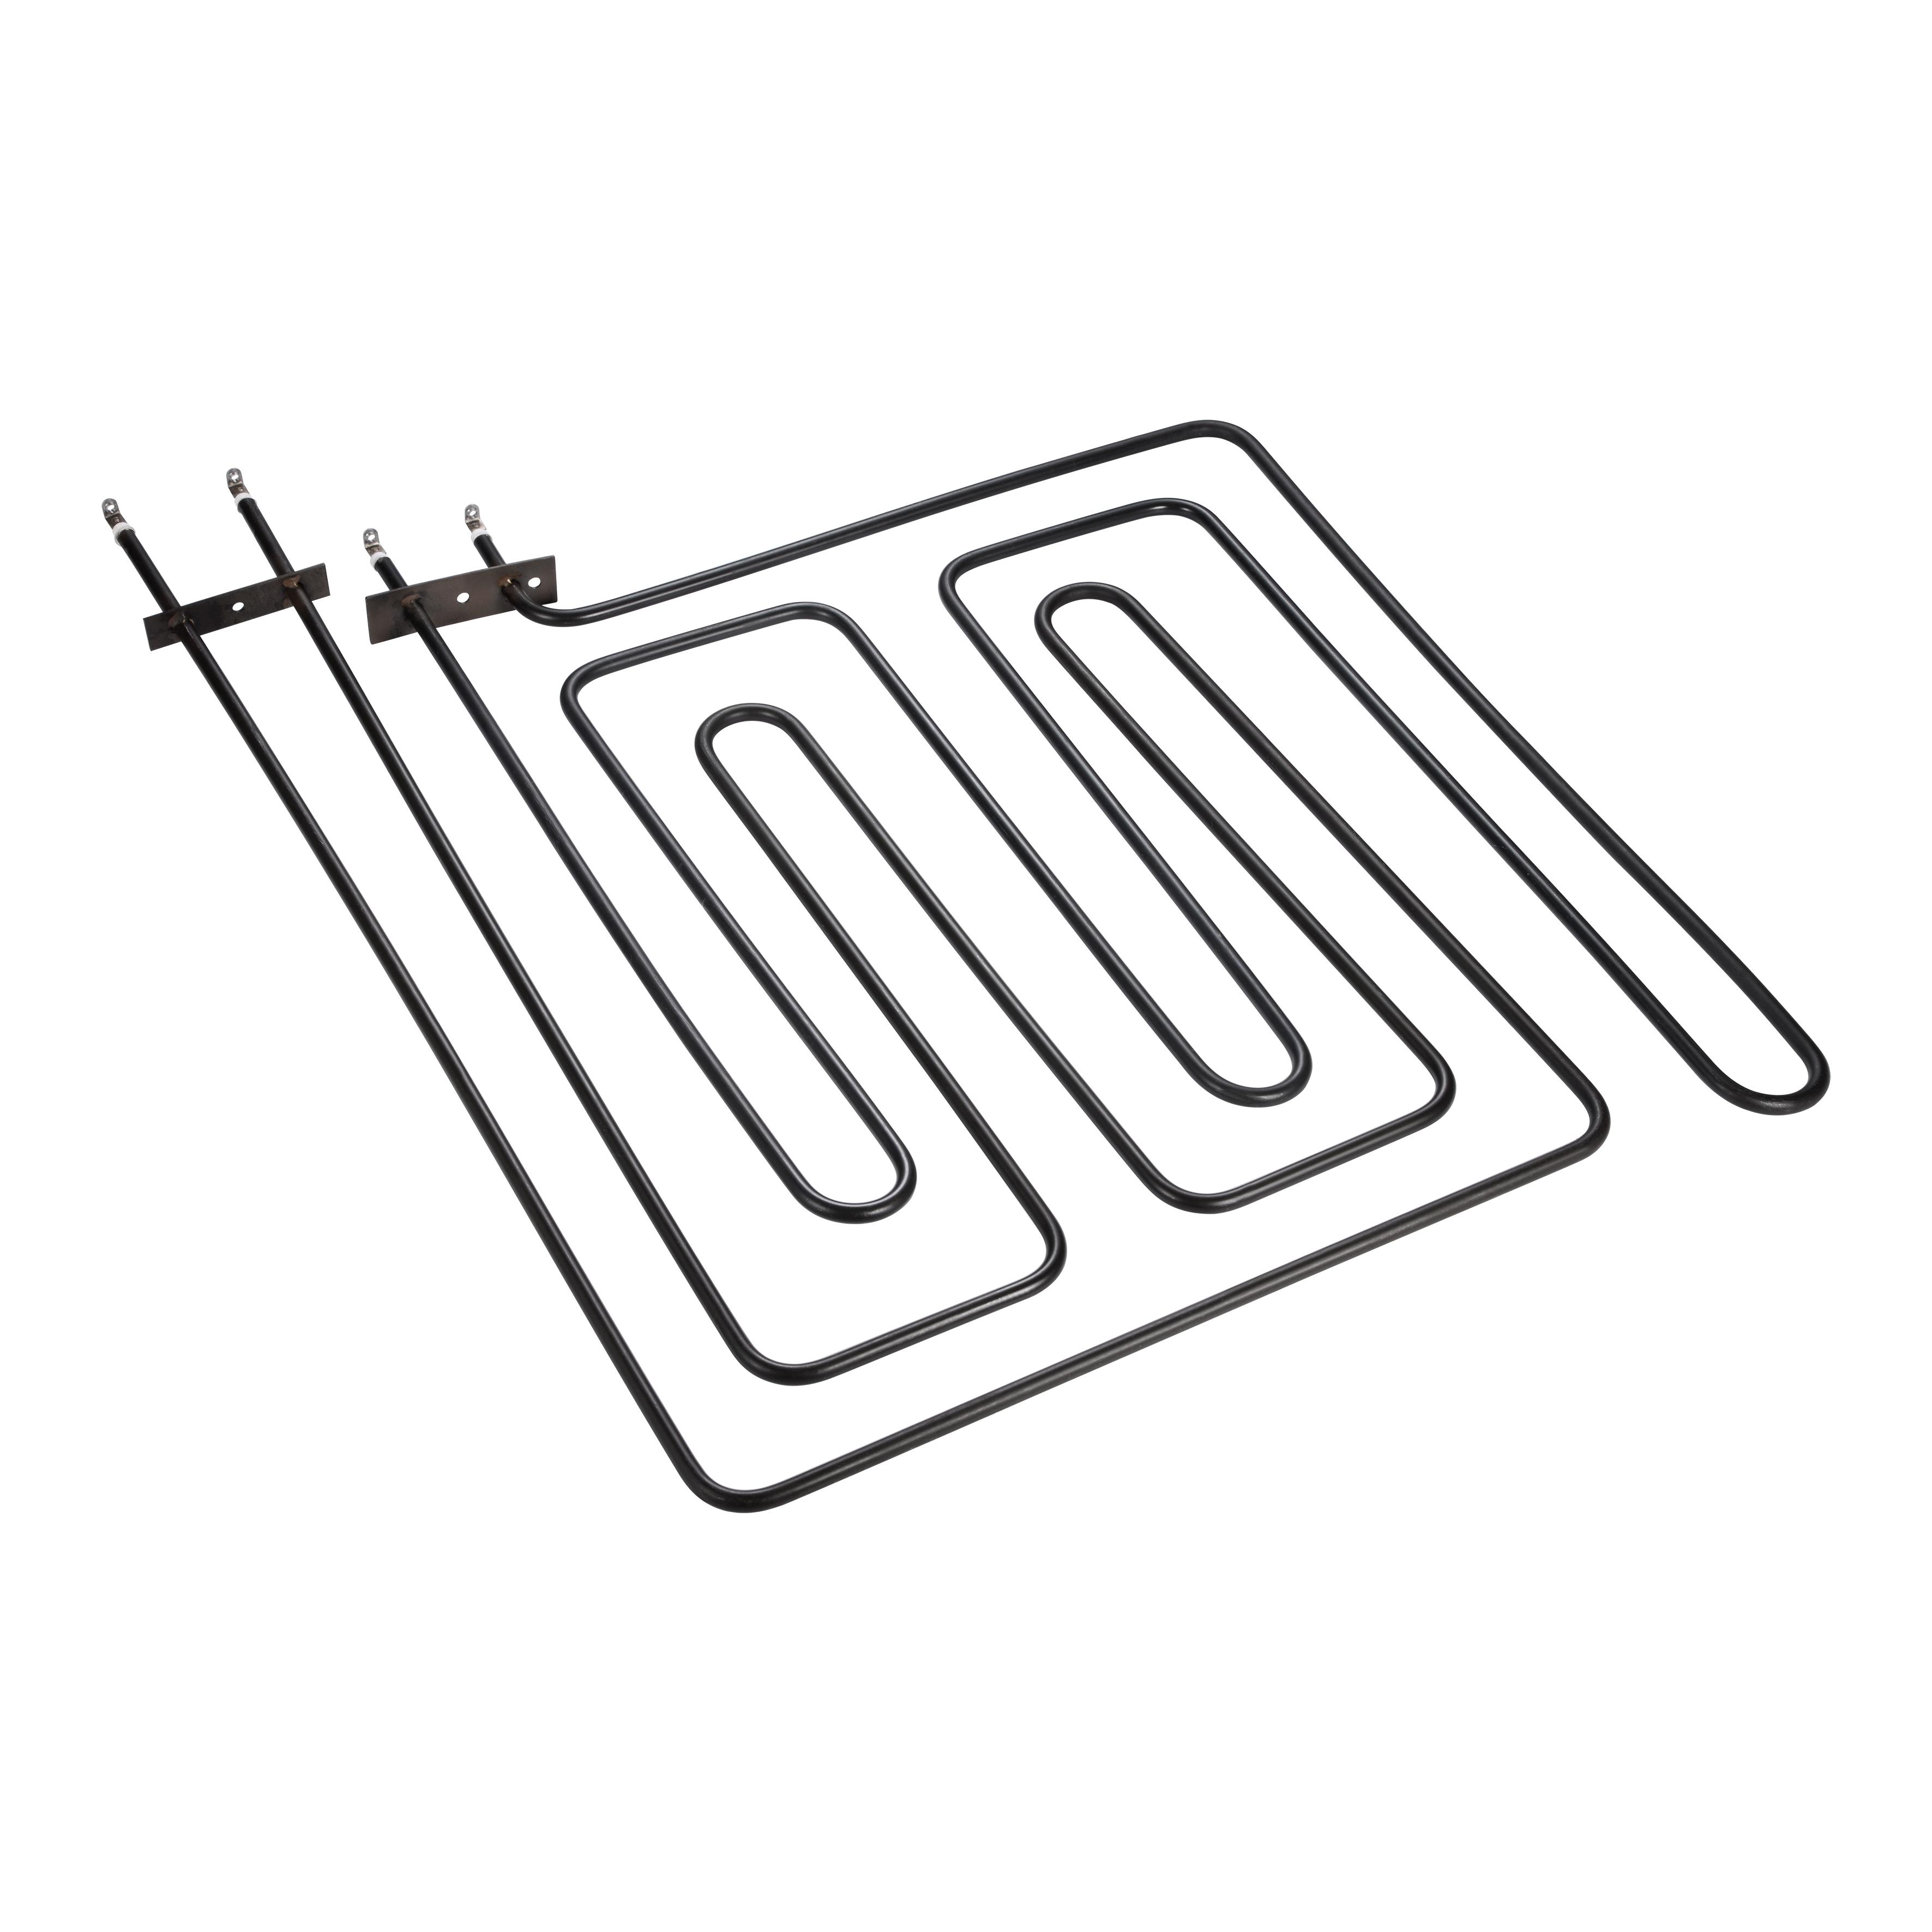 Safe Tubular Rotary Oven Heating Element For Family Bottom Oven Custom Made Heating Element